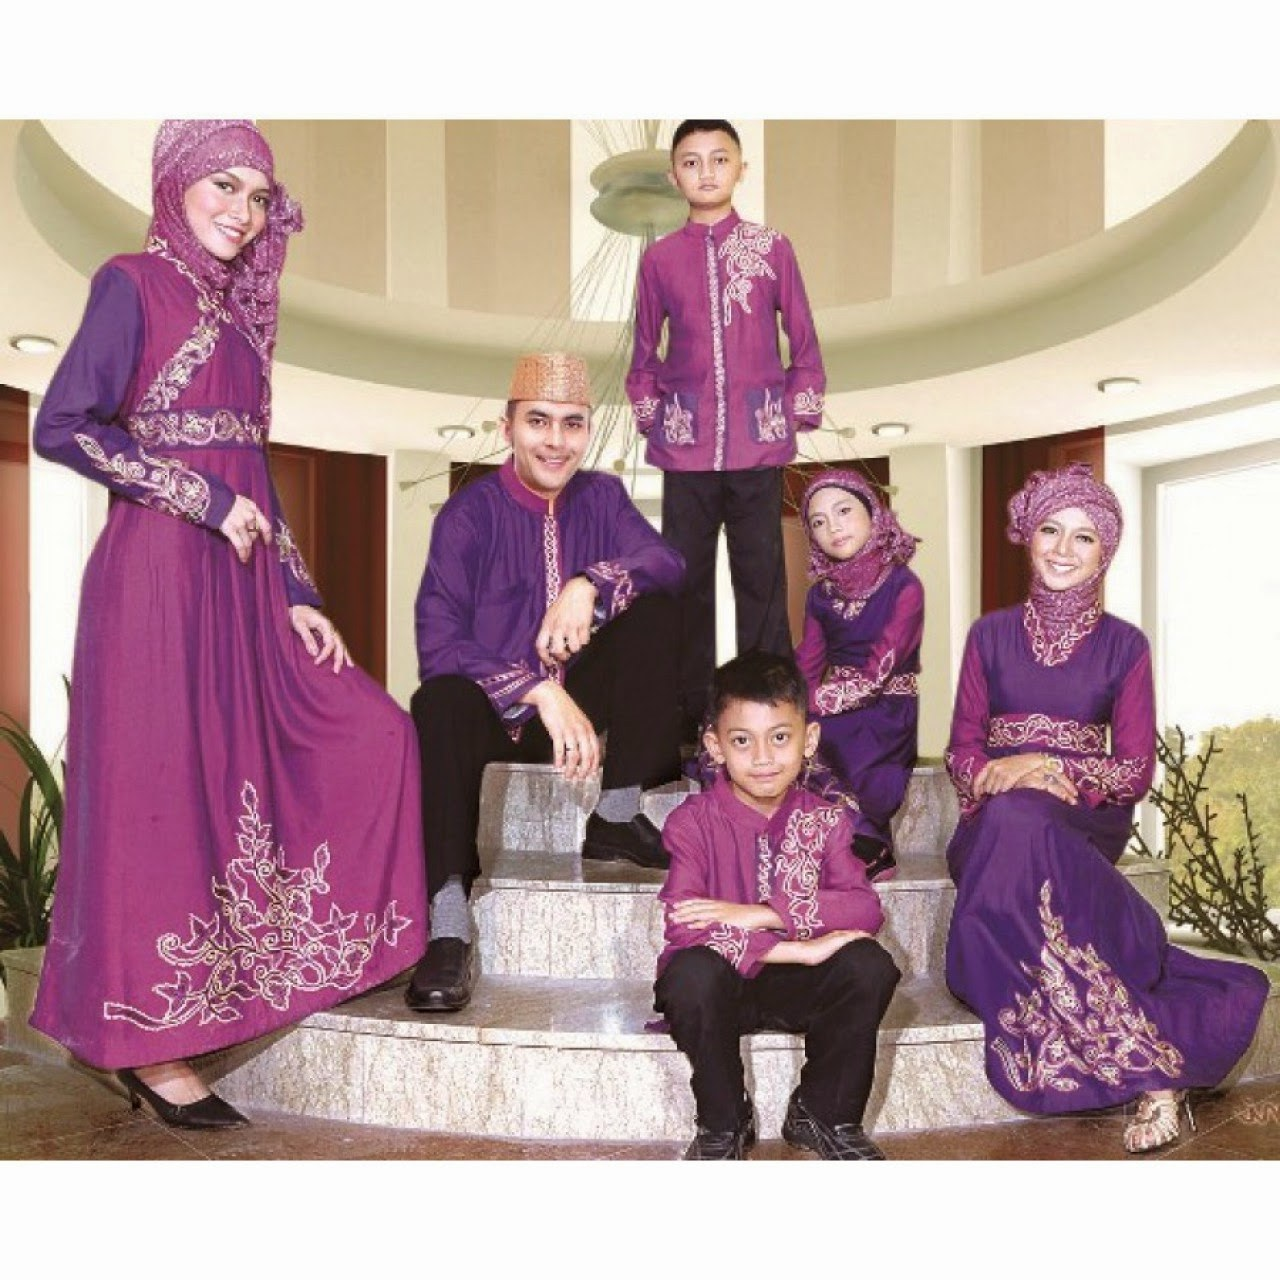 Ide Baju Lebaran Ibu S5d8 Kumpulan Foto Model Baju Kebaya Ibu Dan Anak Trend Baju